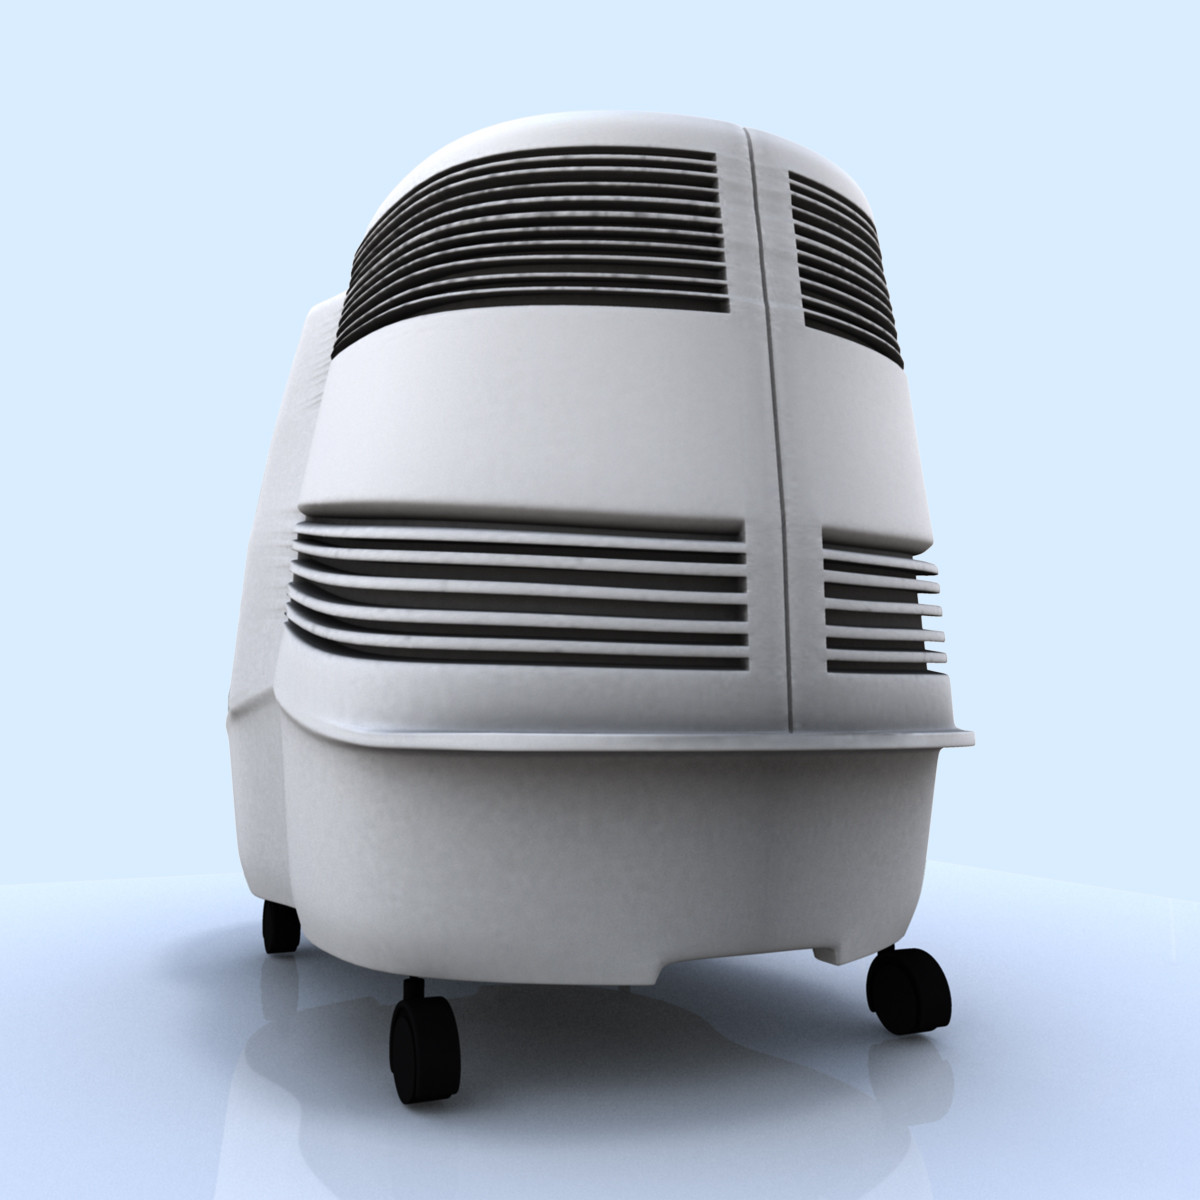 comments 0 honeywell humidifier 3d model honeywell humidifier model #2B62A0